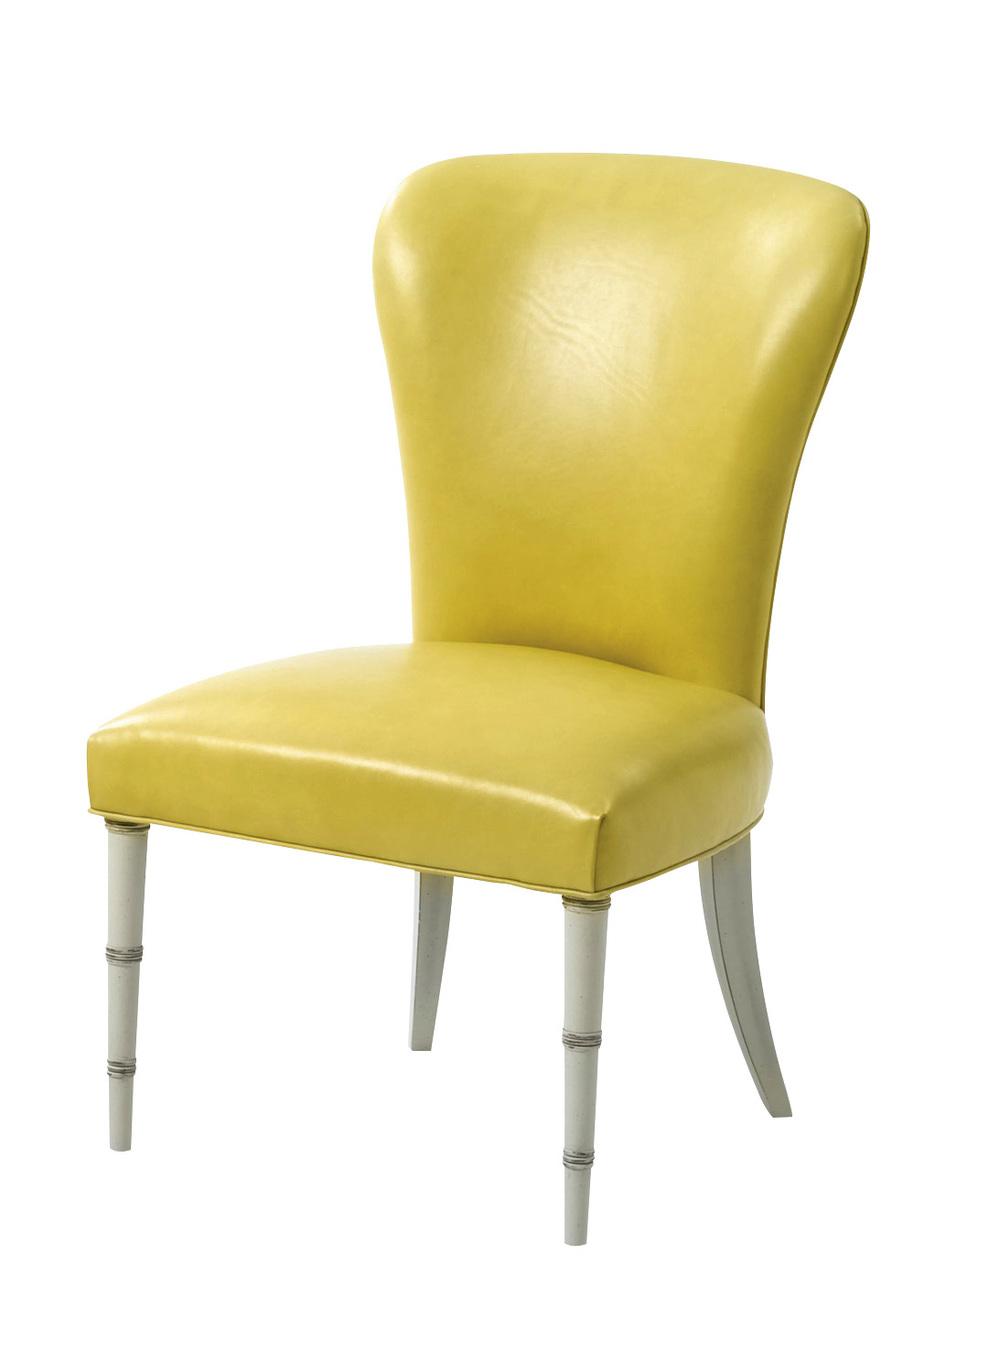 Wesley Hall - Rowan Side Chair